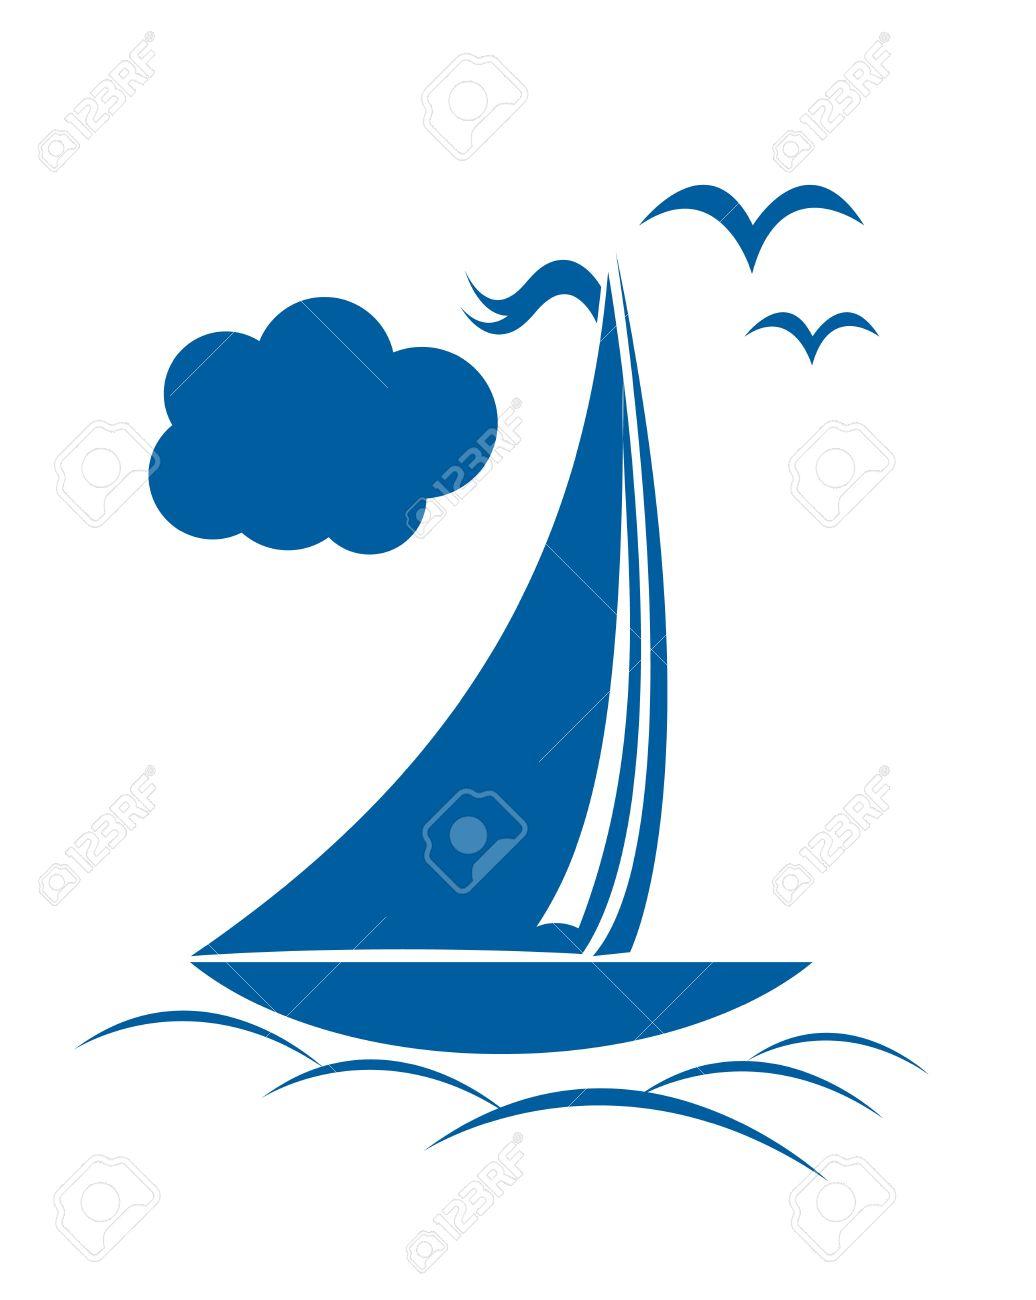 Boat clipart logo. Ocean blue pencil and